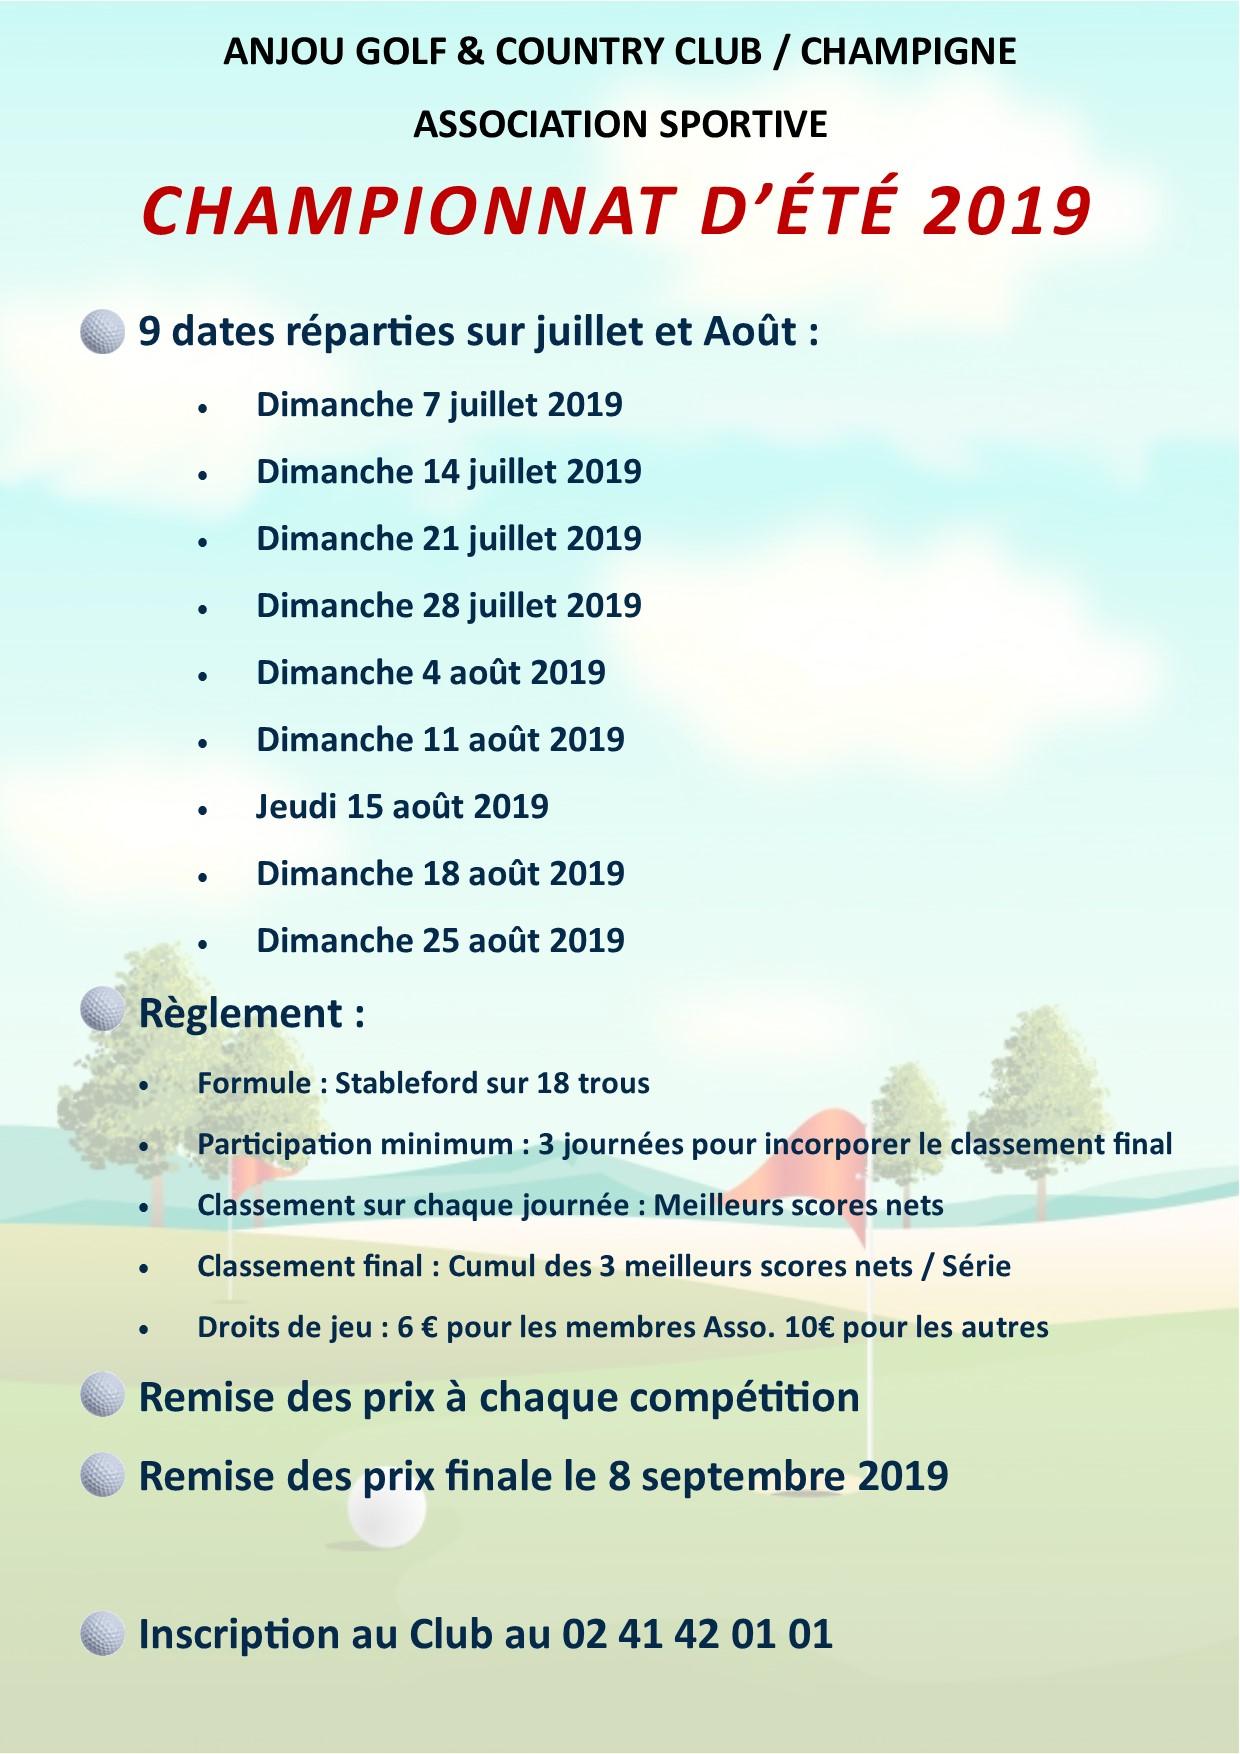 Dates Championnat ete Anjou Golf .jpg